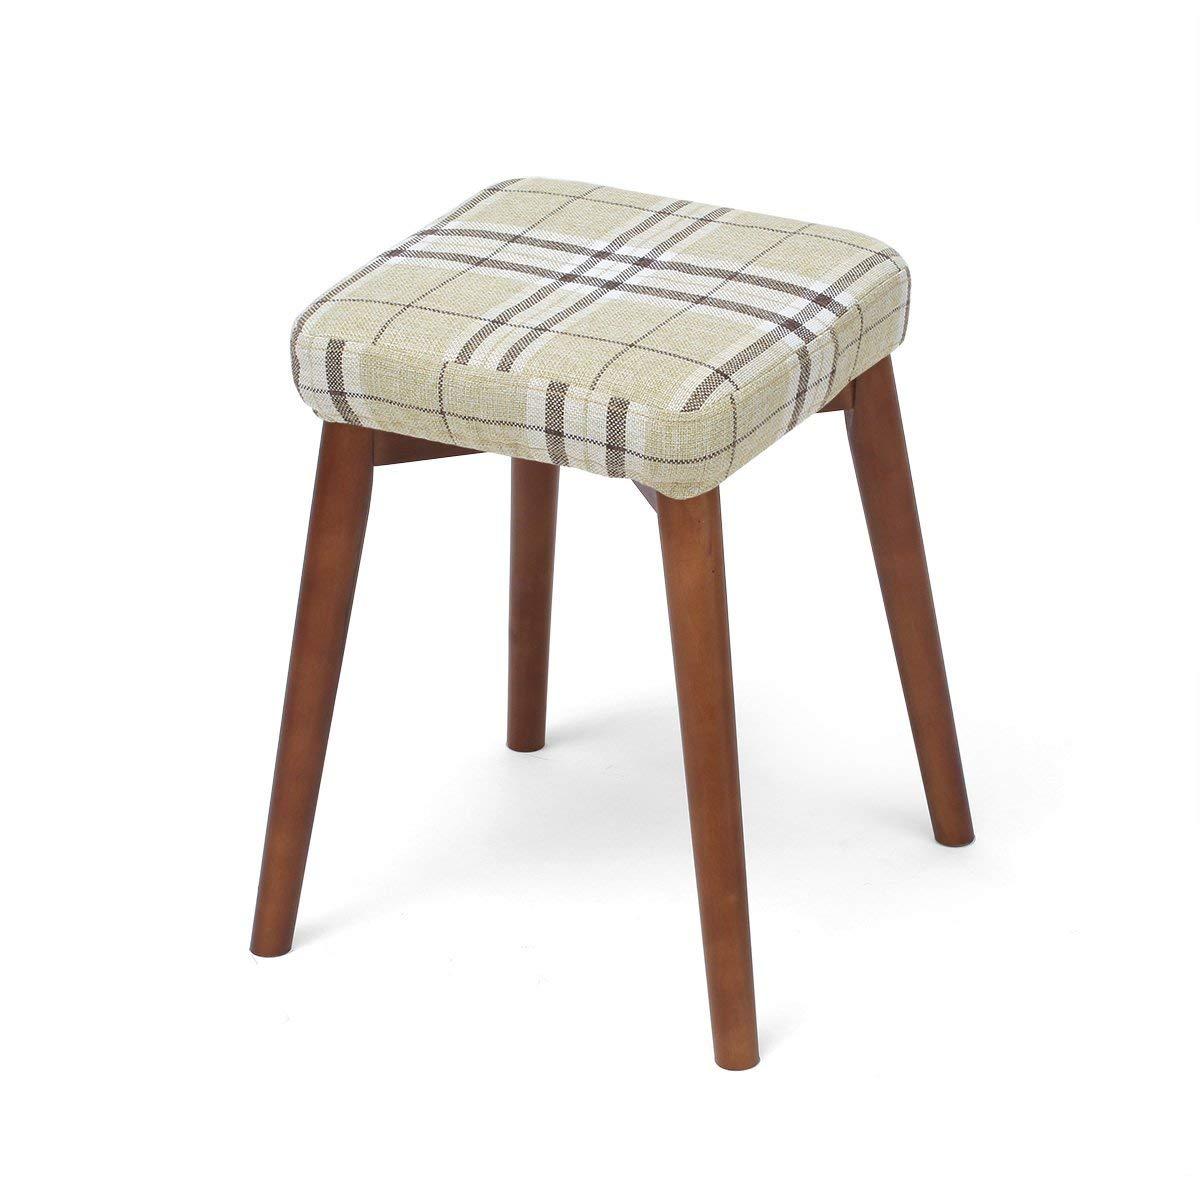 Comfortable Lounge Chair Fashion Creative Solid Wood Makeup Stool Home Stool